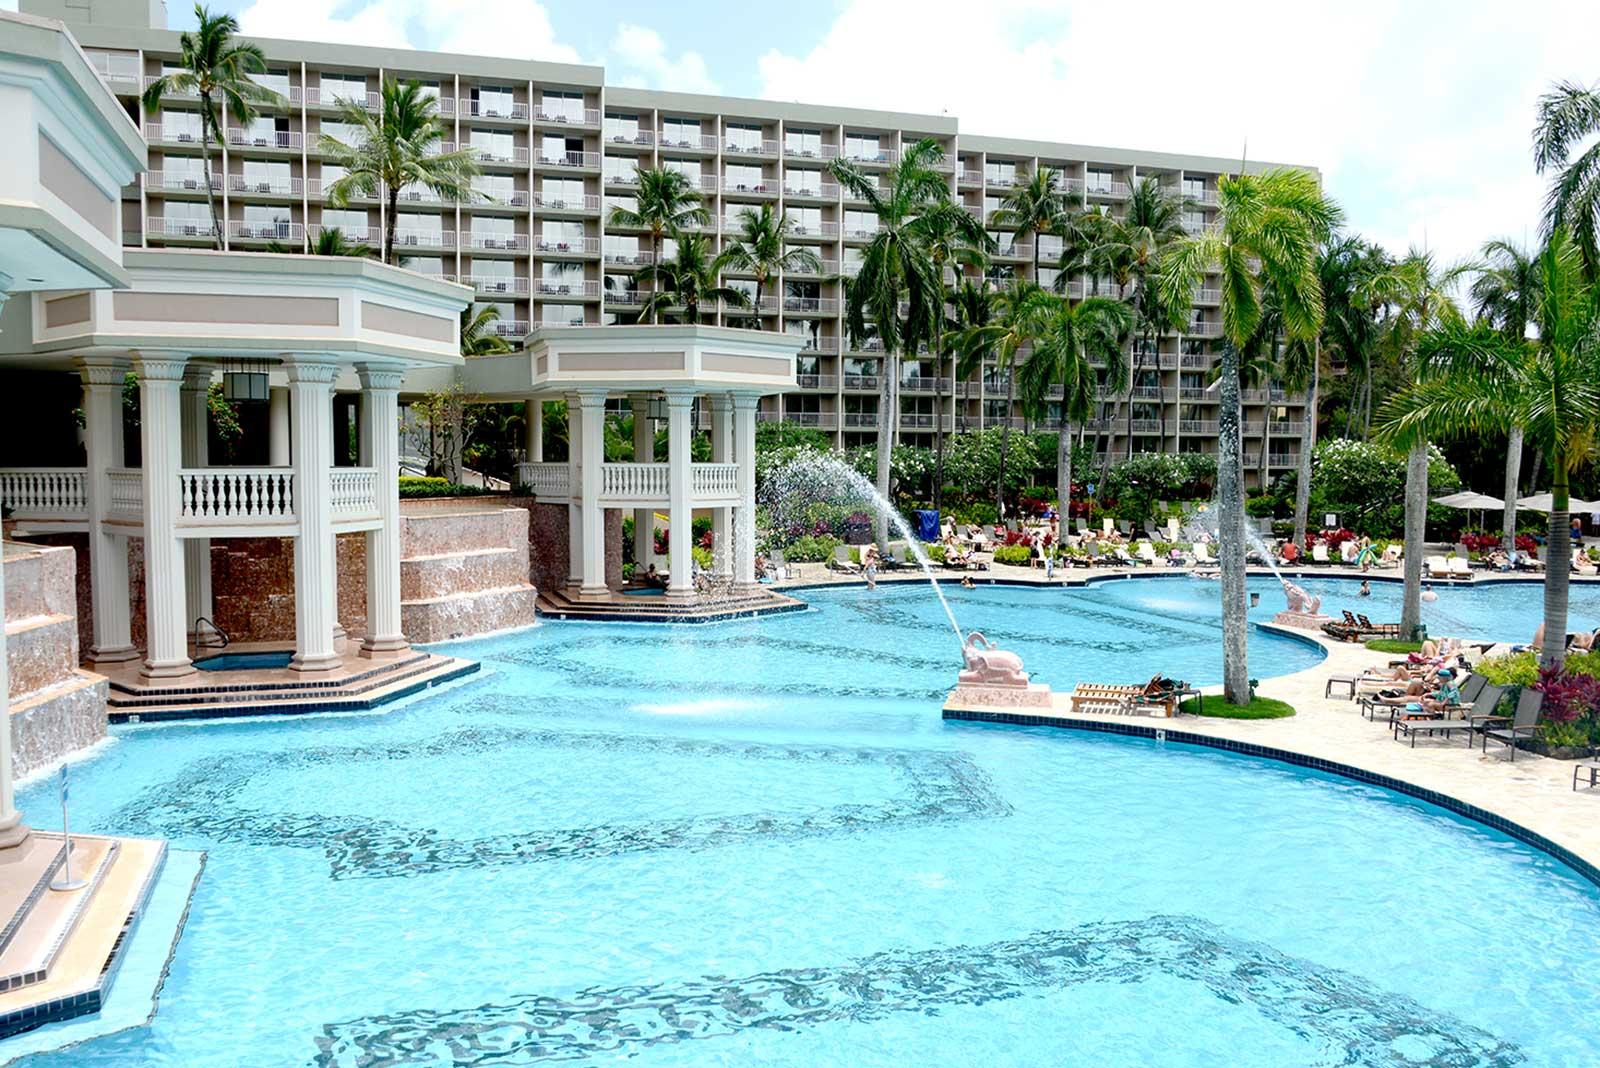 Marriott-Kauai-Beach-Club-Resort-36